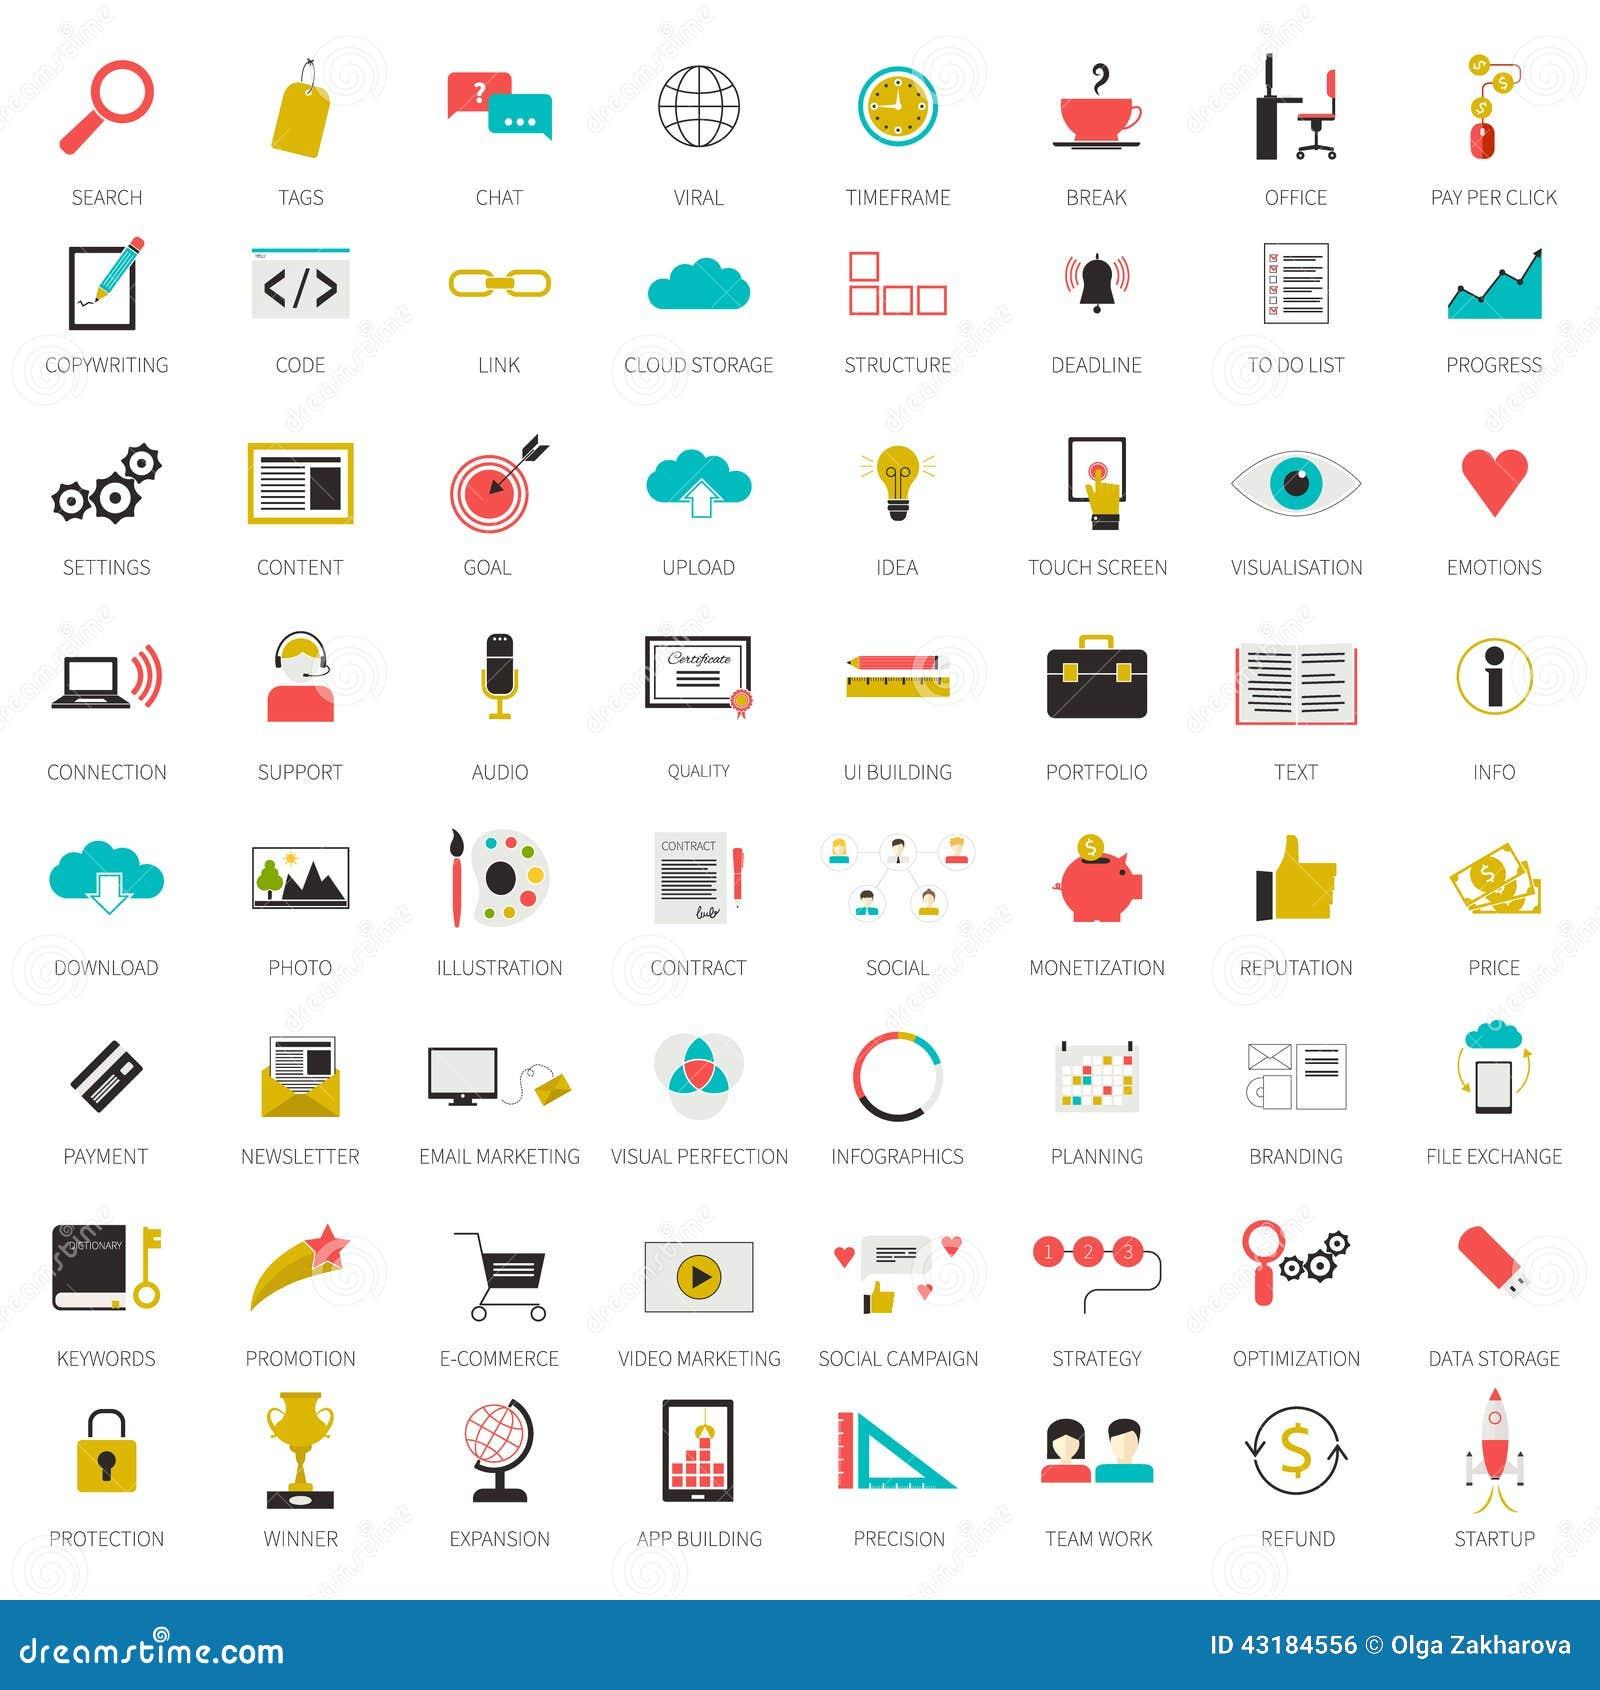 Seo icons big set stock illustration illustration of cloud 43184556 seo icons big set biocorpaavc Choice Image